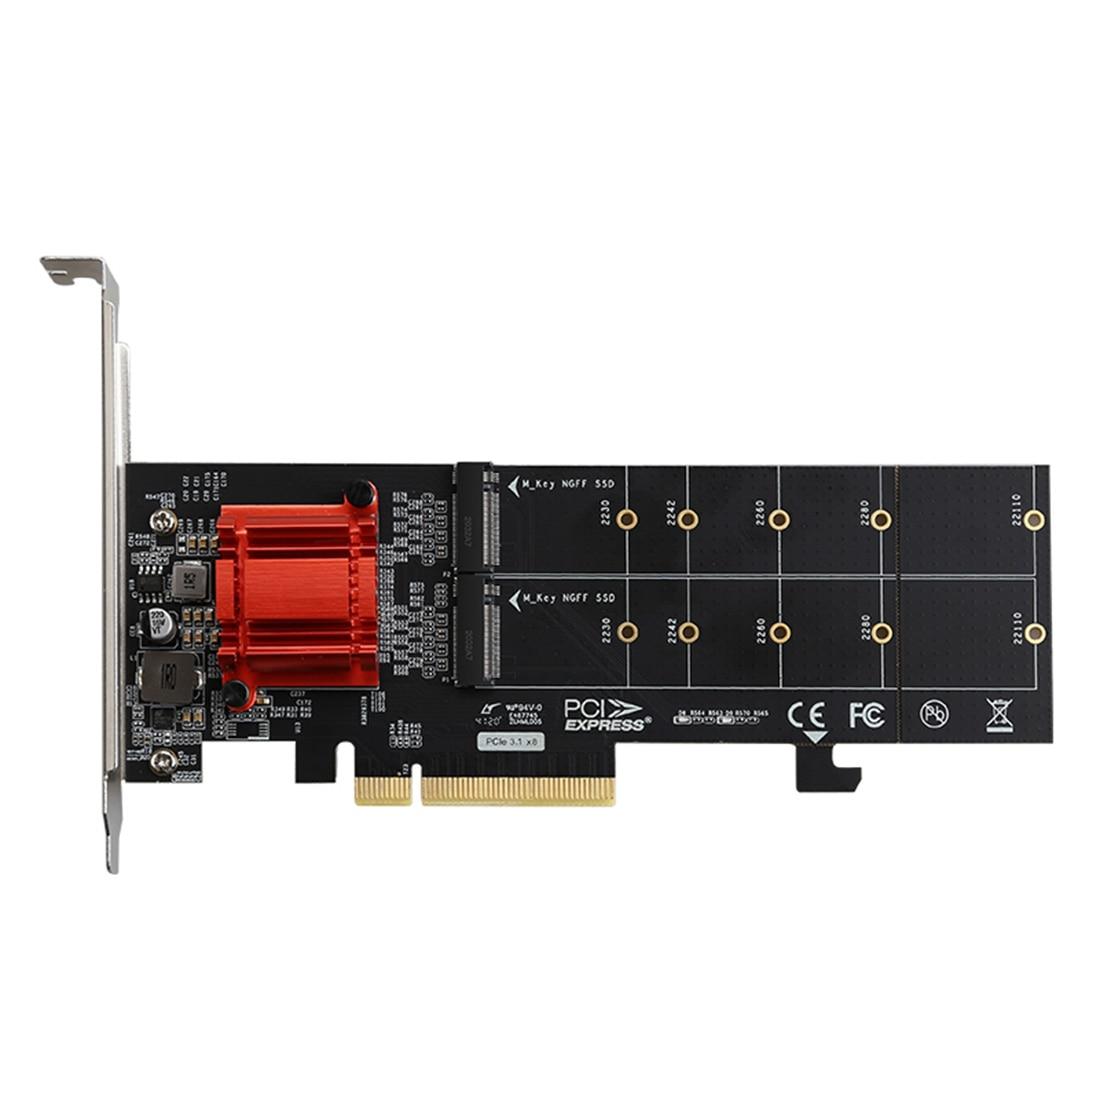 DIEWU-محول توسيع TXB122 PCIe ، 3.1x8 ASM1812 إلى 2 منافذ M.2 SSD ، بطاقة توسيع ، محول M-key إلى Pci-e لـ NVME 2230-22110 SSD